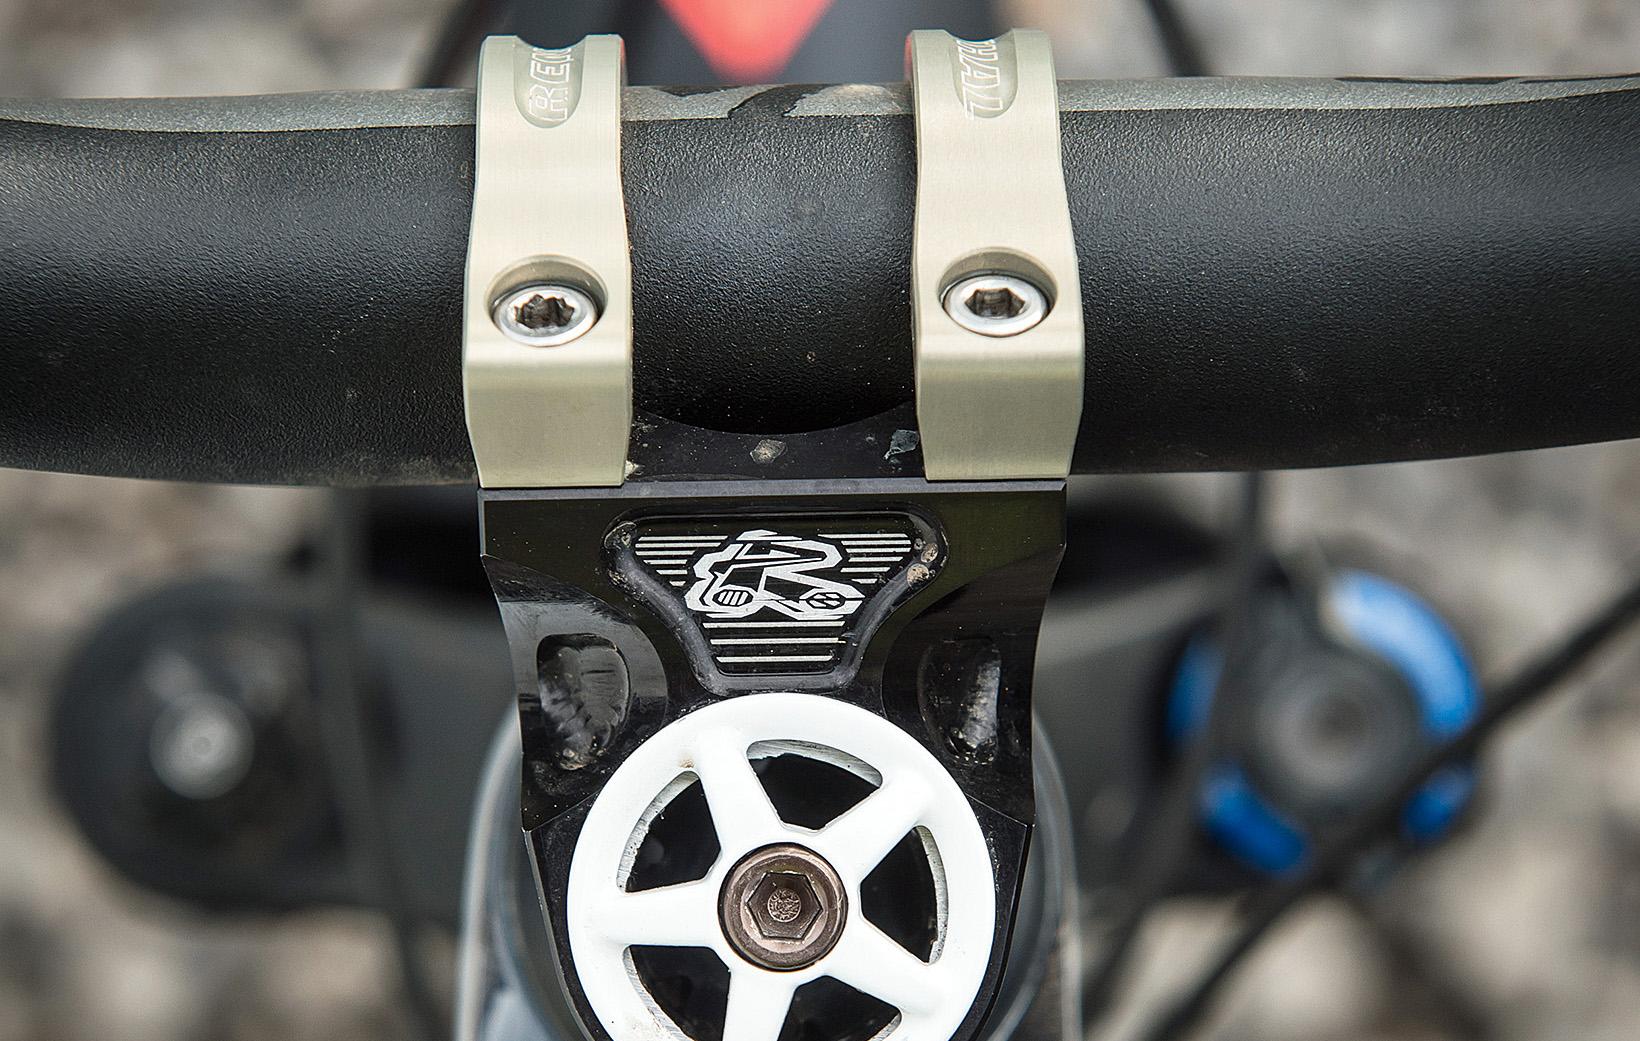 Aluminum Alloy, Black Red BMX MTB Road Bike ISOAR 31.8 Stem 45mm MTB Mountain Bike Stem Short Handlebar Stem for Most Bicycle Fixie Gear Cycling